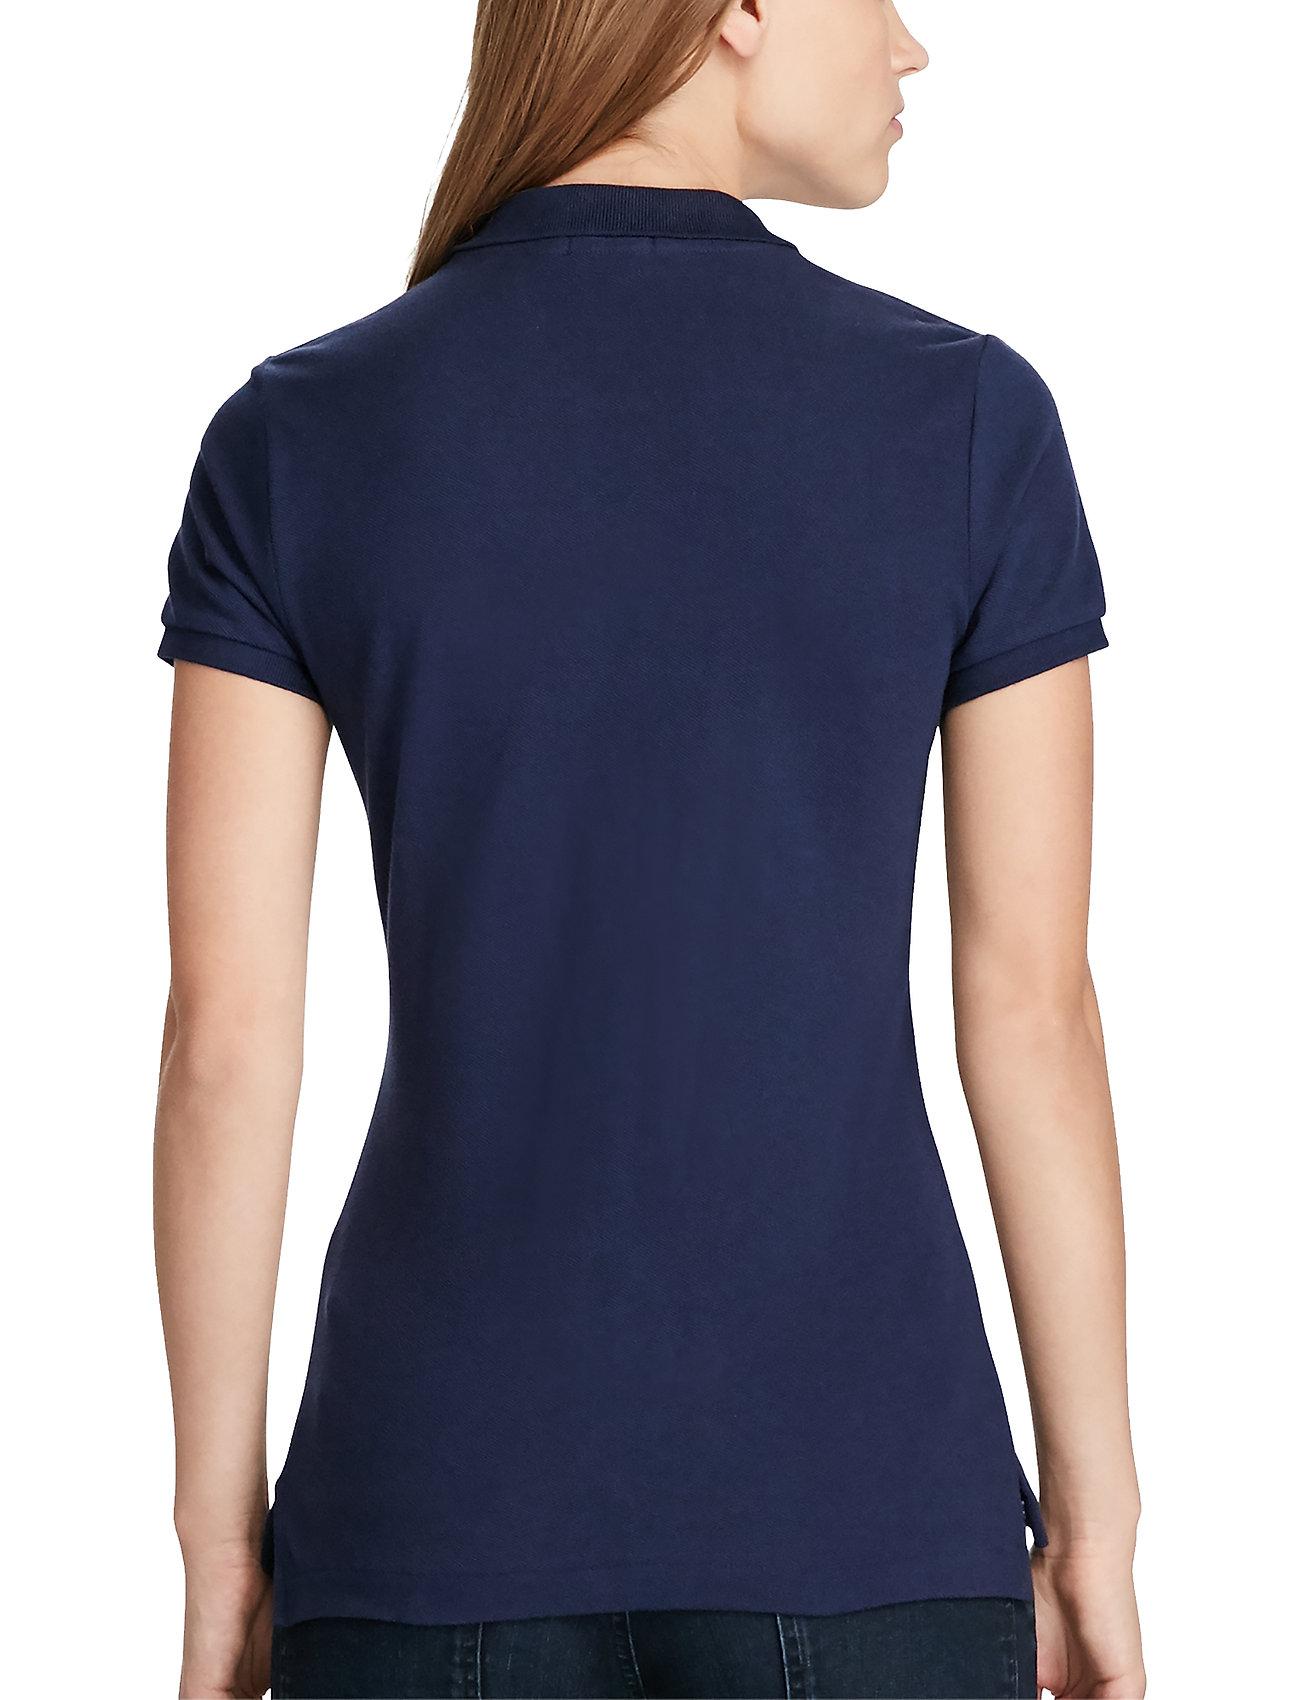 Skinny-fit Big Pony Polo Shirt (Newport Navy) (1099 kr) - Polo Ralph Lauren